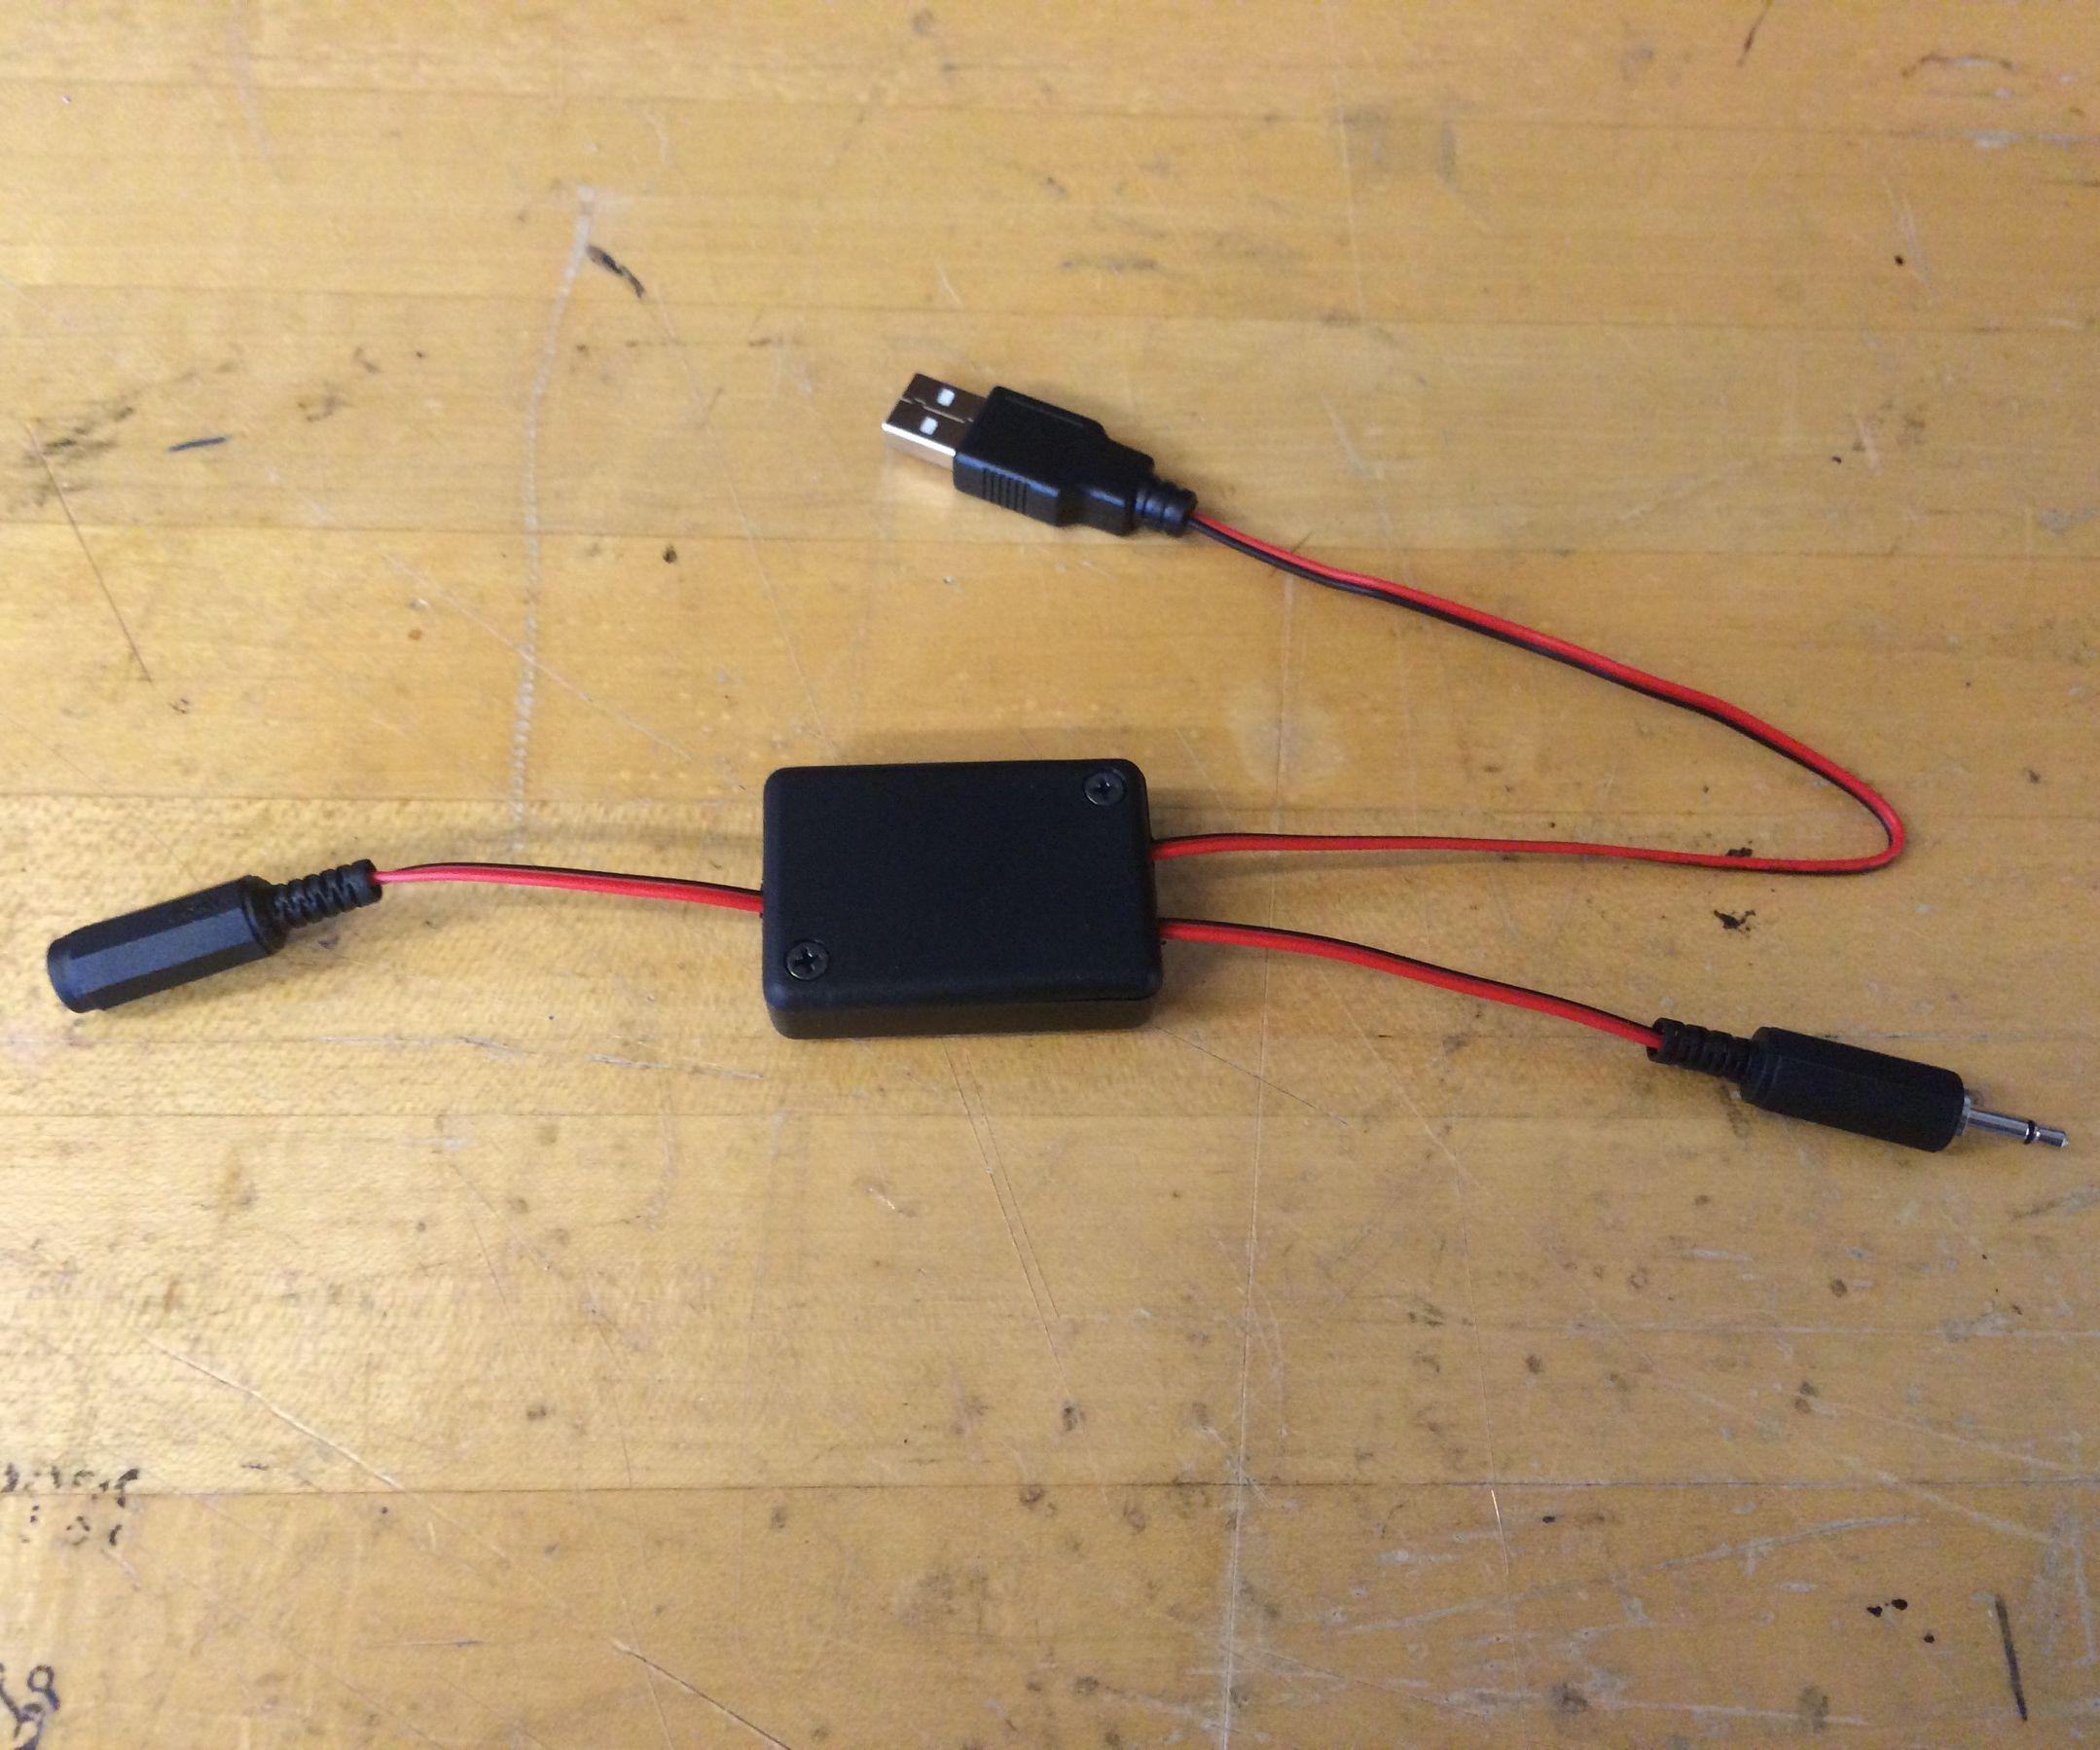 macaronkit usb powered mono audio amplifier [ 2100 x 1750 Pixel ]